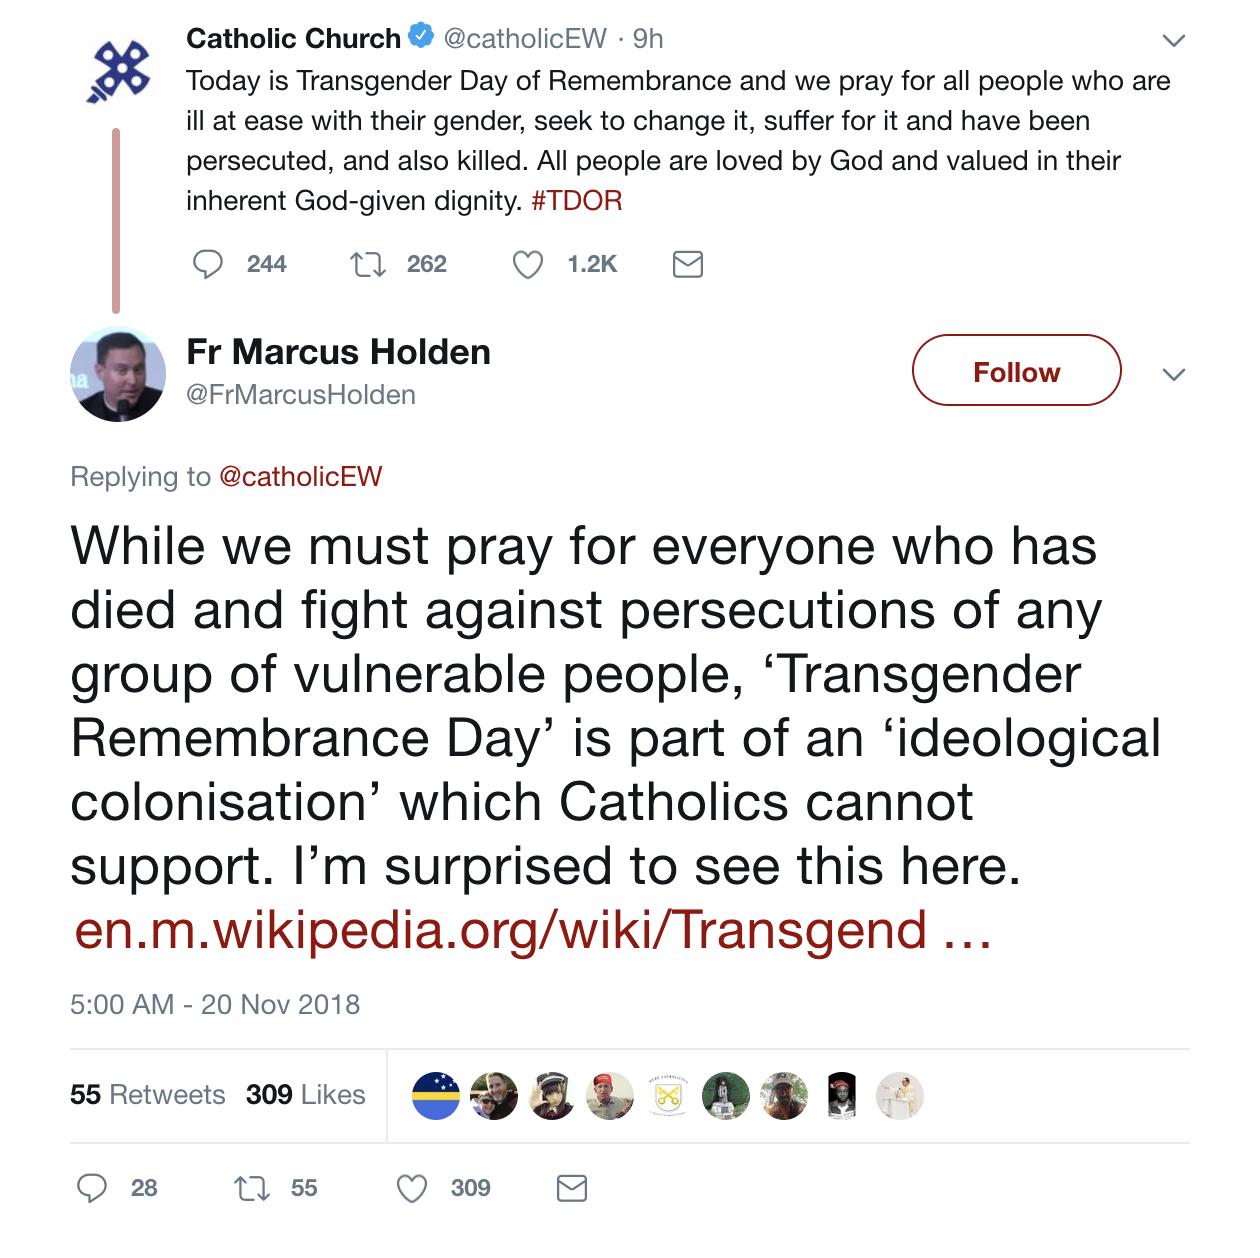 British bishops under fire for recognizing pro-transgender 'day of remembrance'